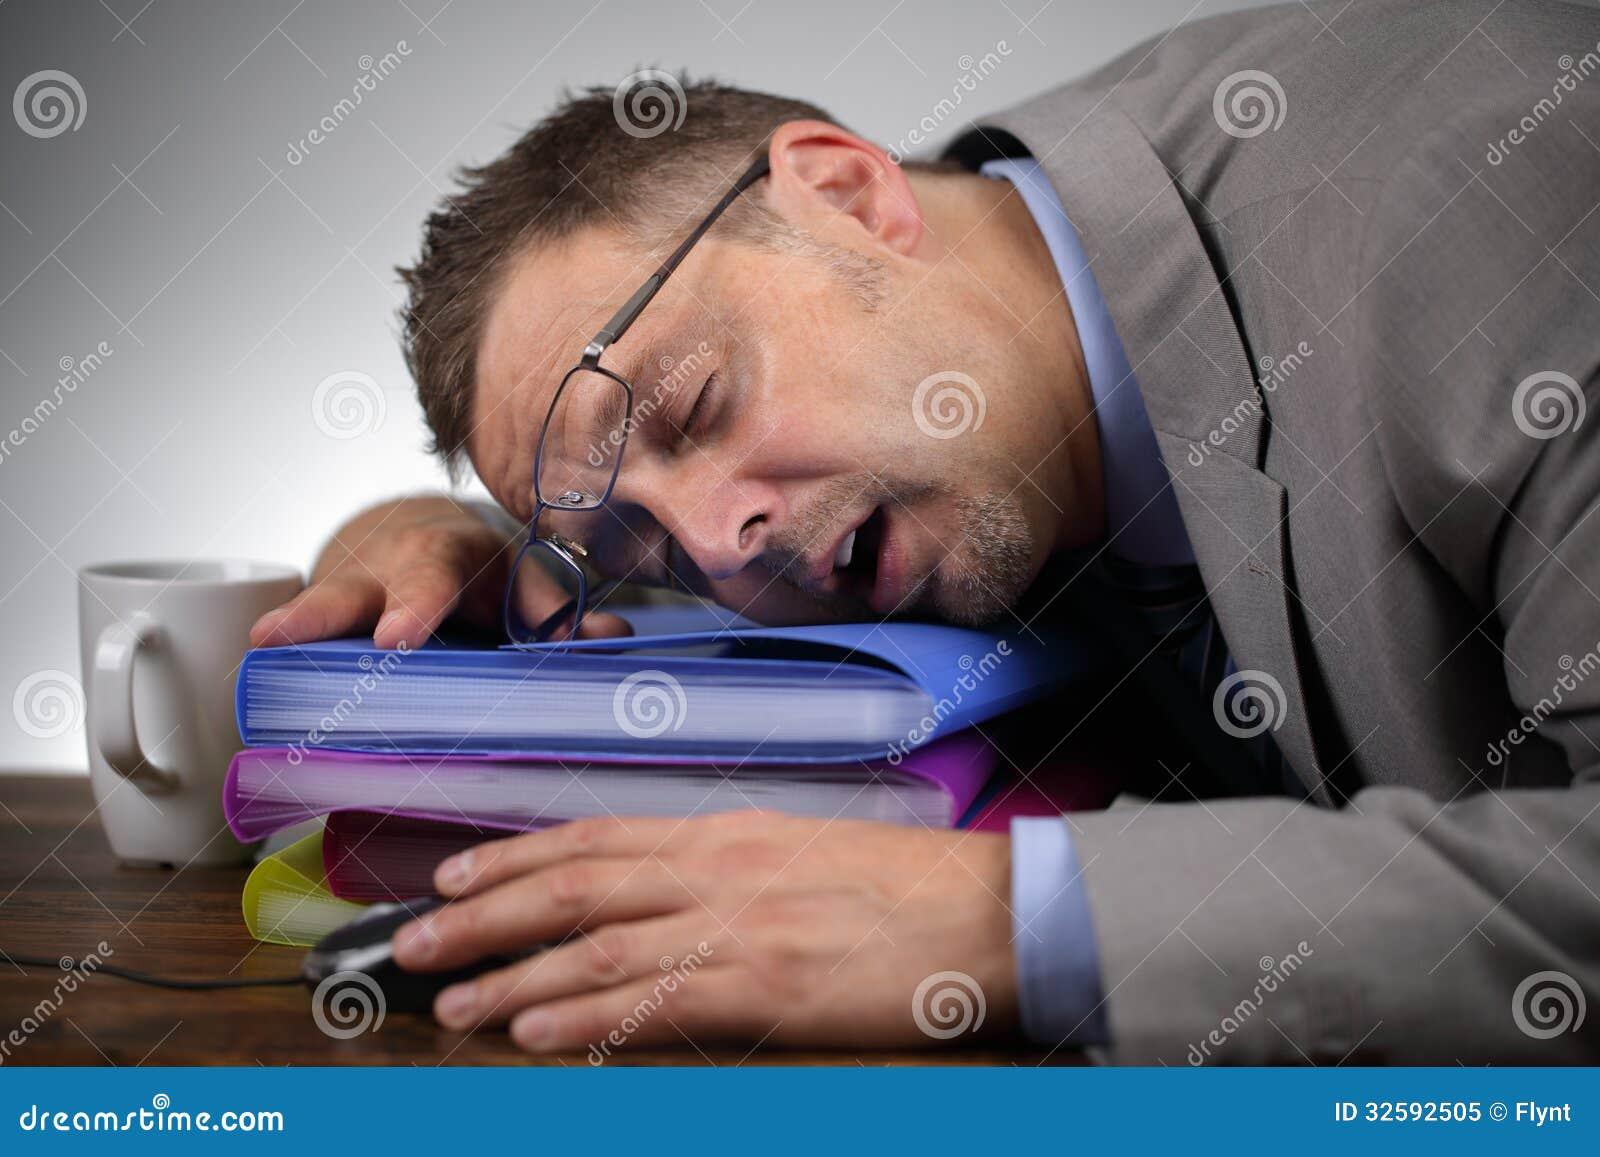 Sleeping on the job royalty free stock photo image 32592505